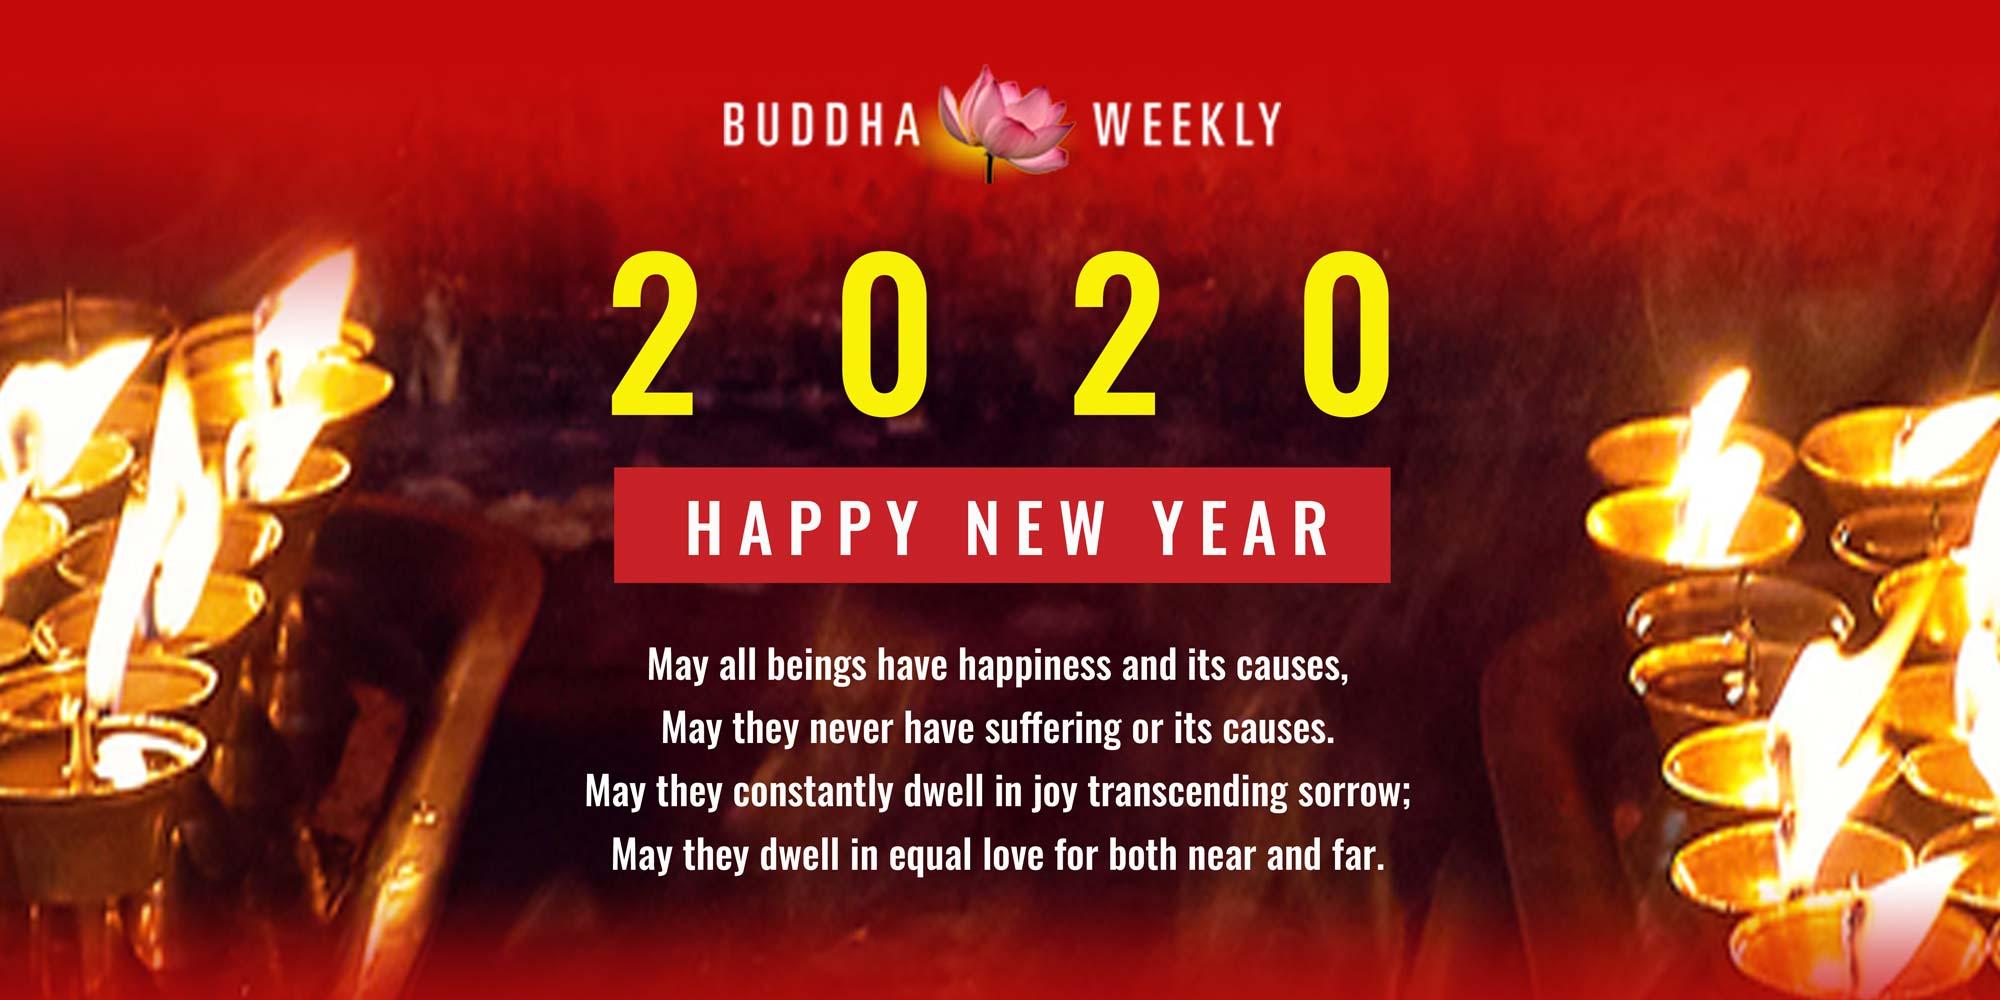 BUDDHA WEEKLY NEW YEAR 2020